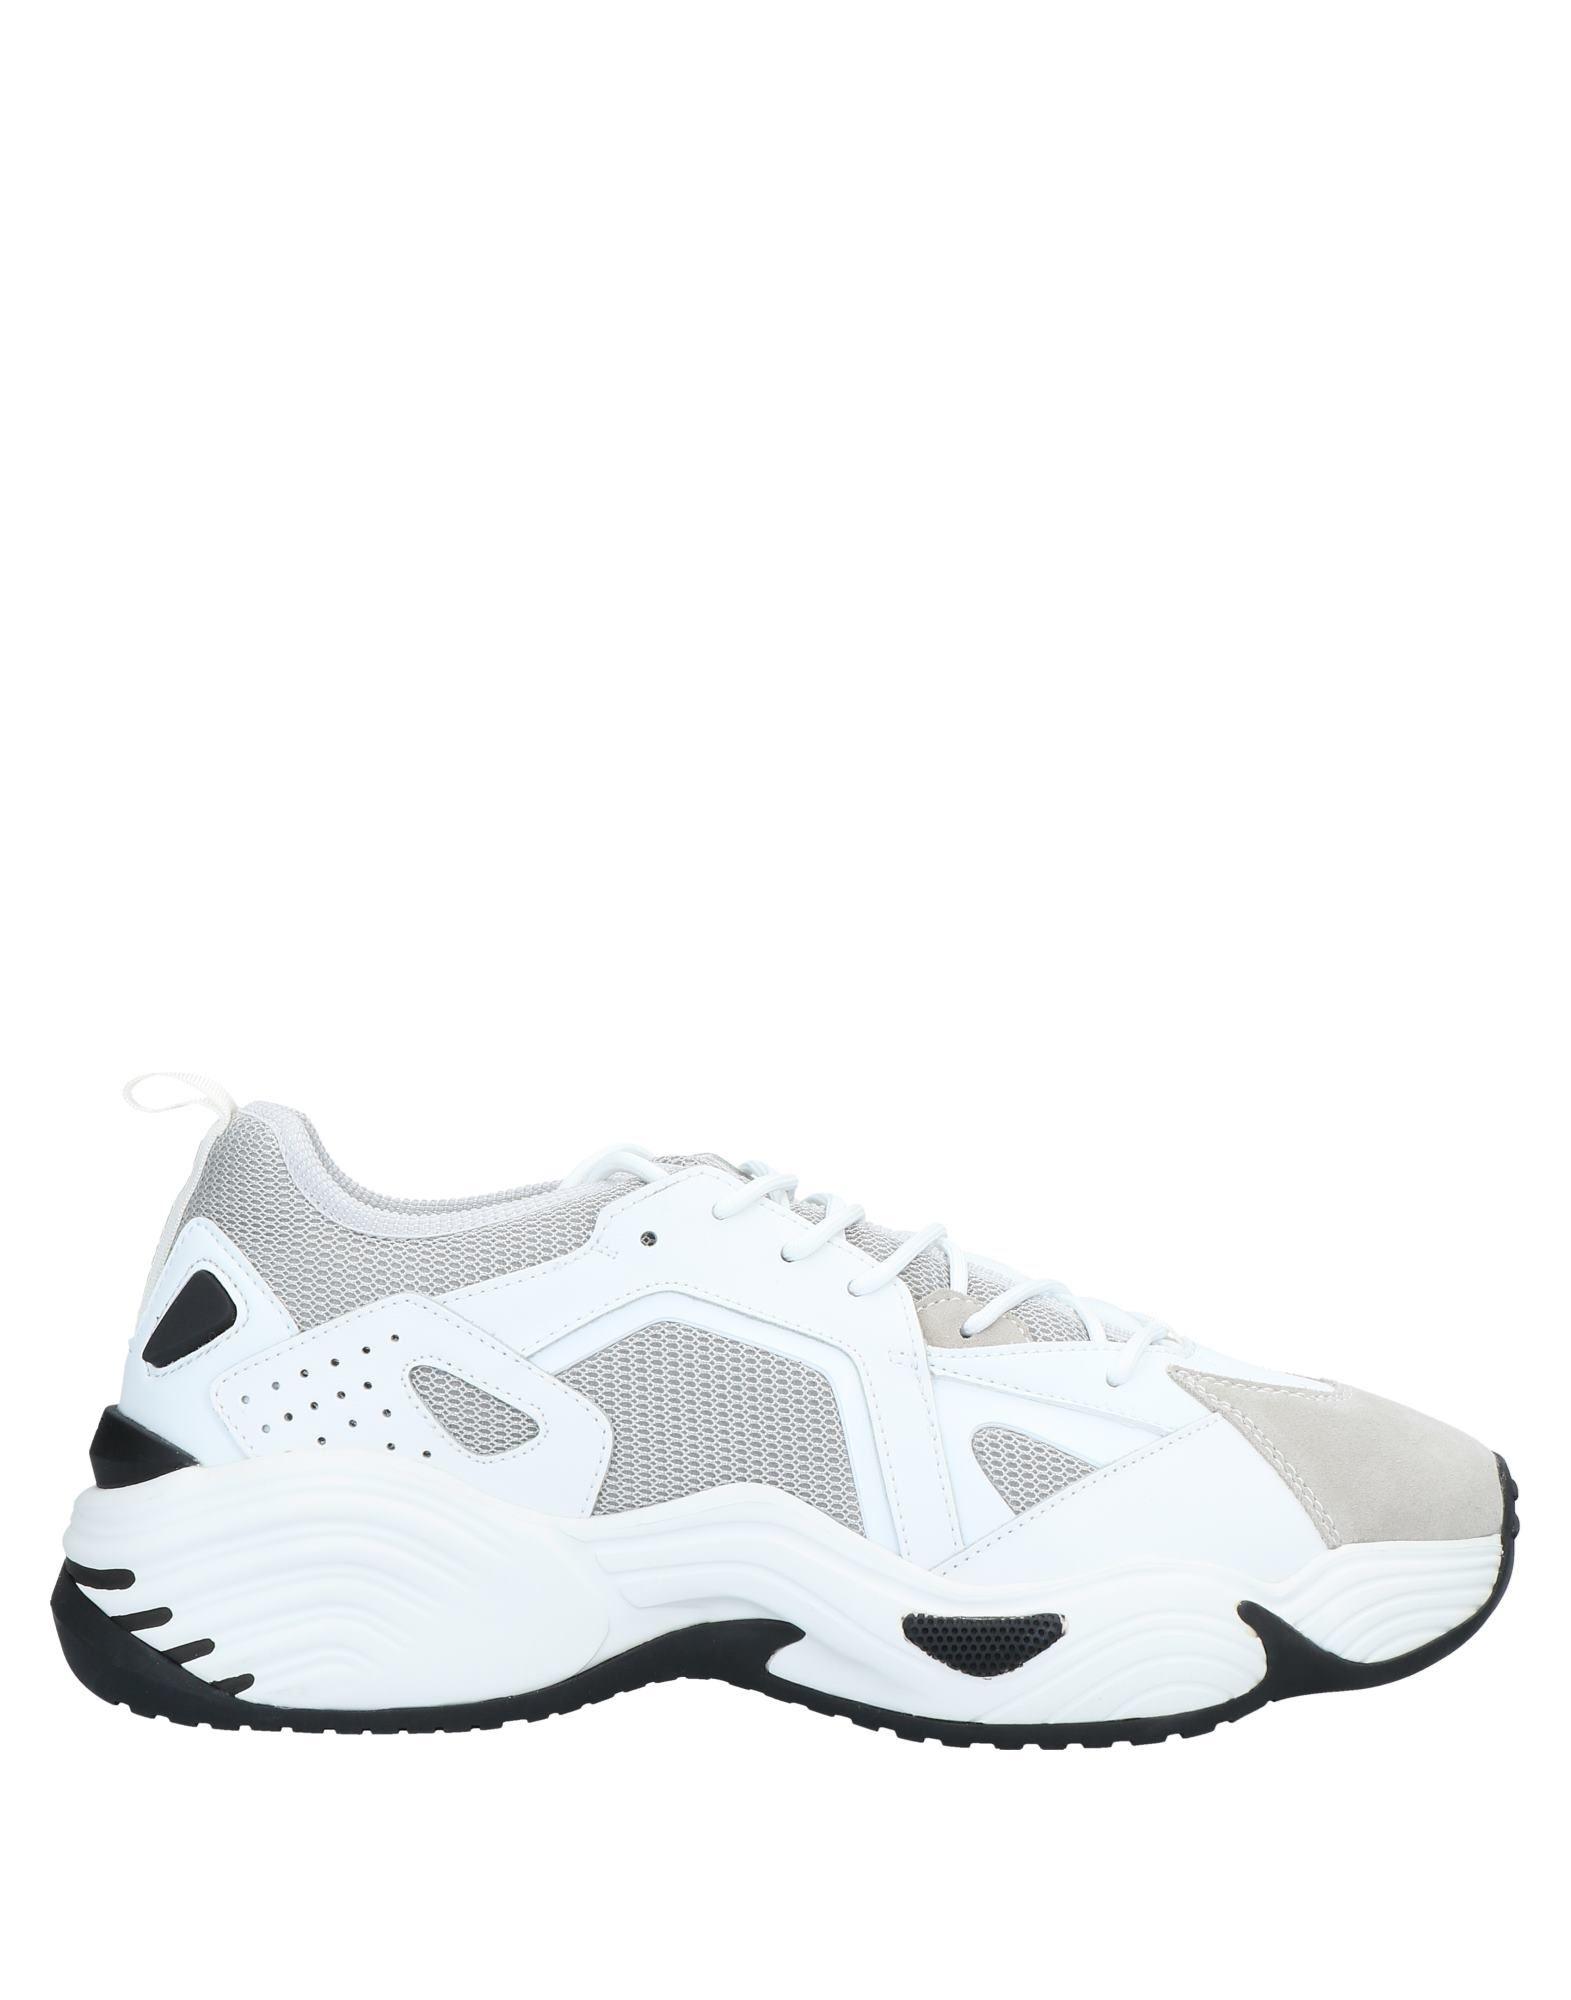 EMPORIO ARMANI Low-tops & sneakers - Item 17006745